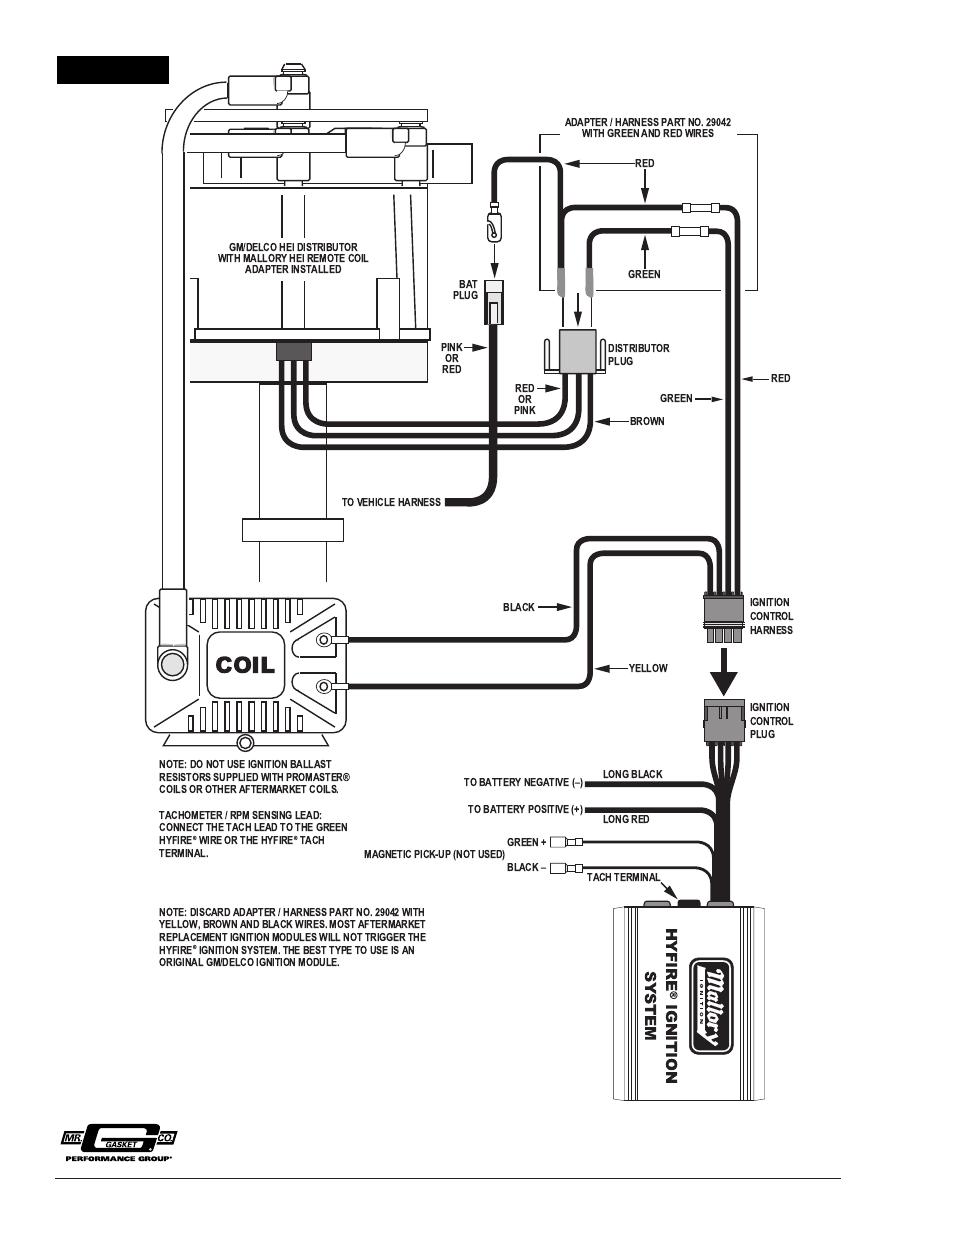 Ems Pro Wiring Diagram Hei Complete Diagrams Gm Schematic Alternator Rh Banyan Palace Com